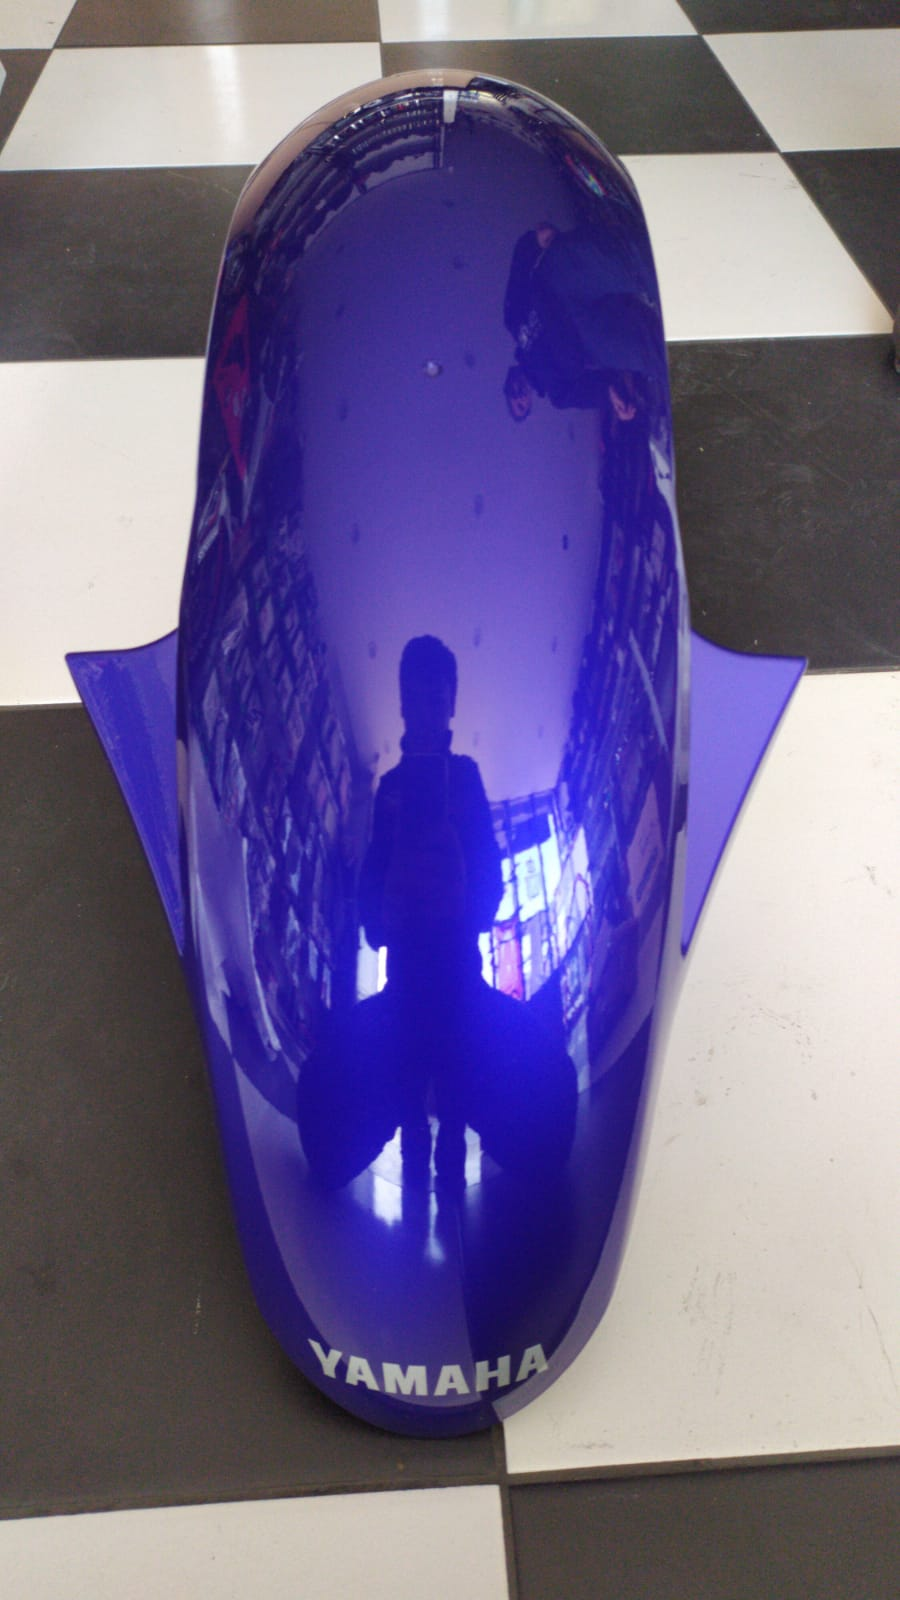 Yamaha R25 Çamurluk 2019 model